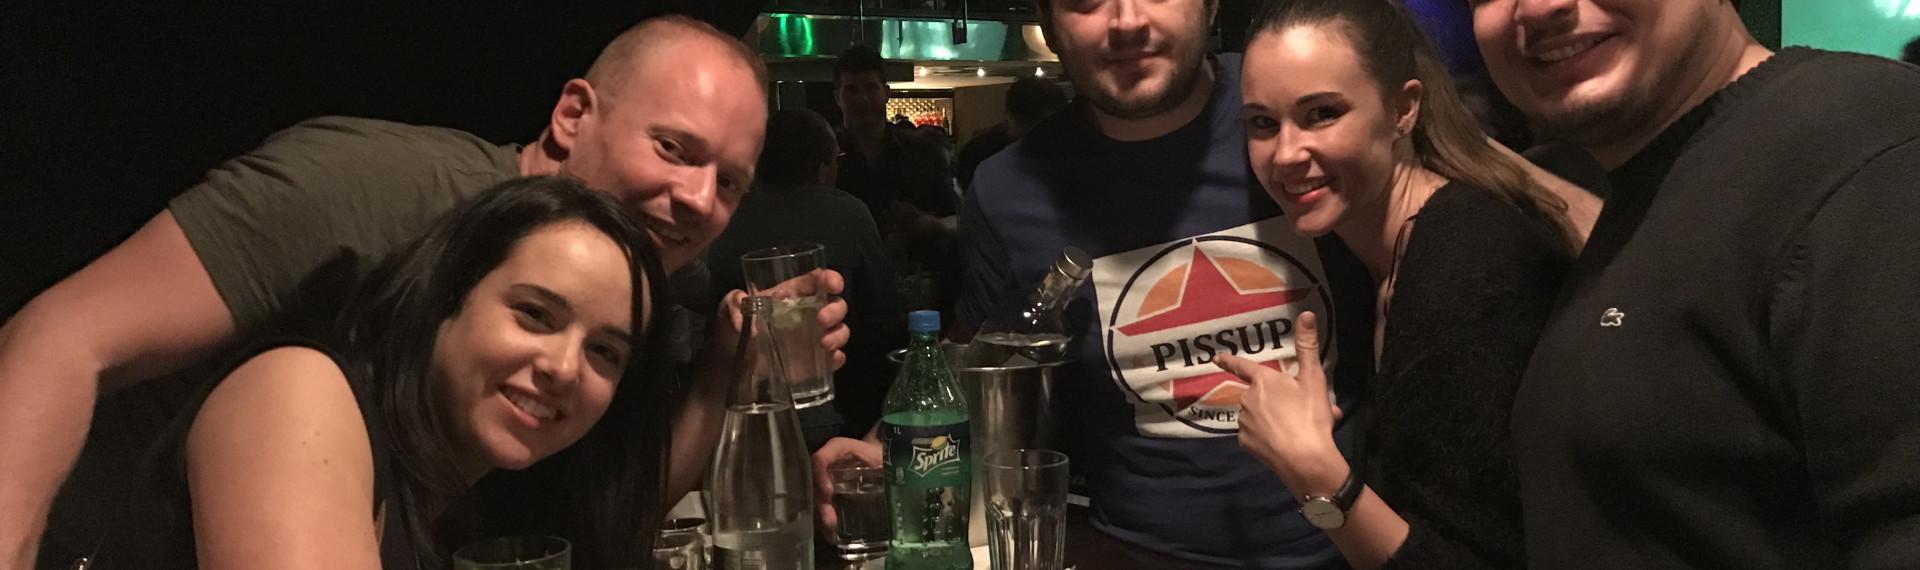 P*ssup Bar Guide Prague